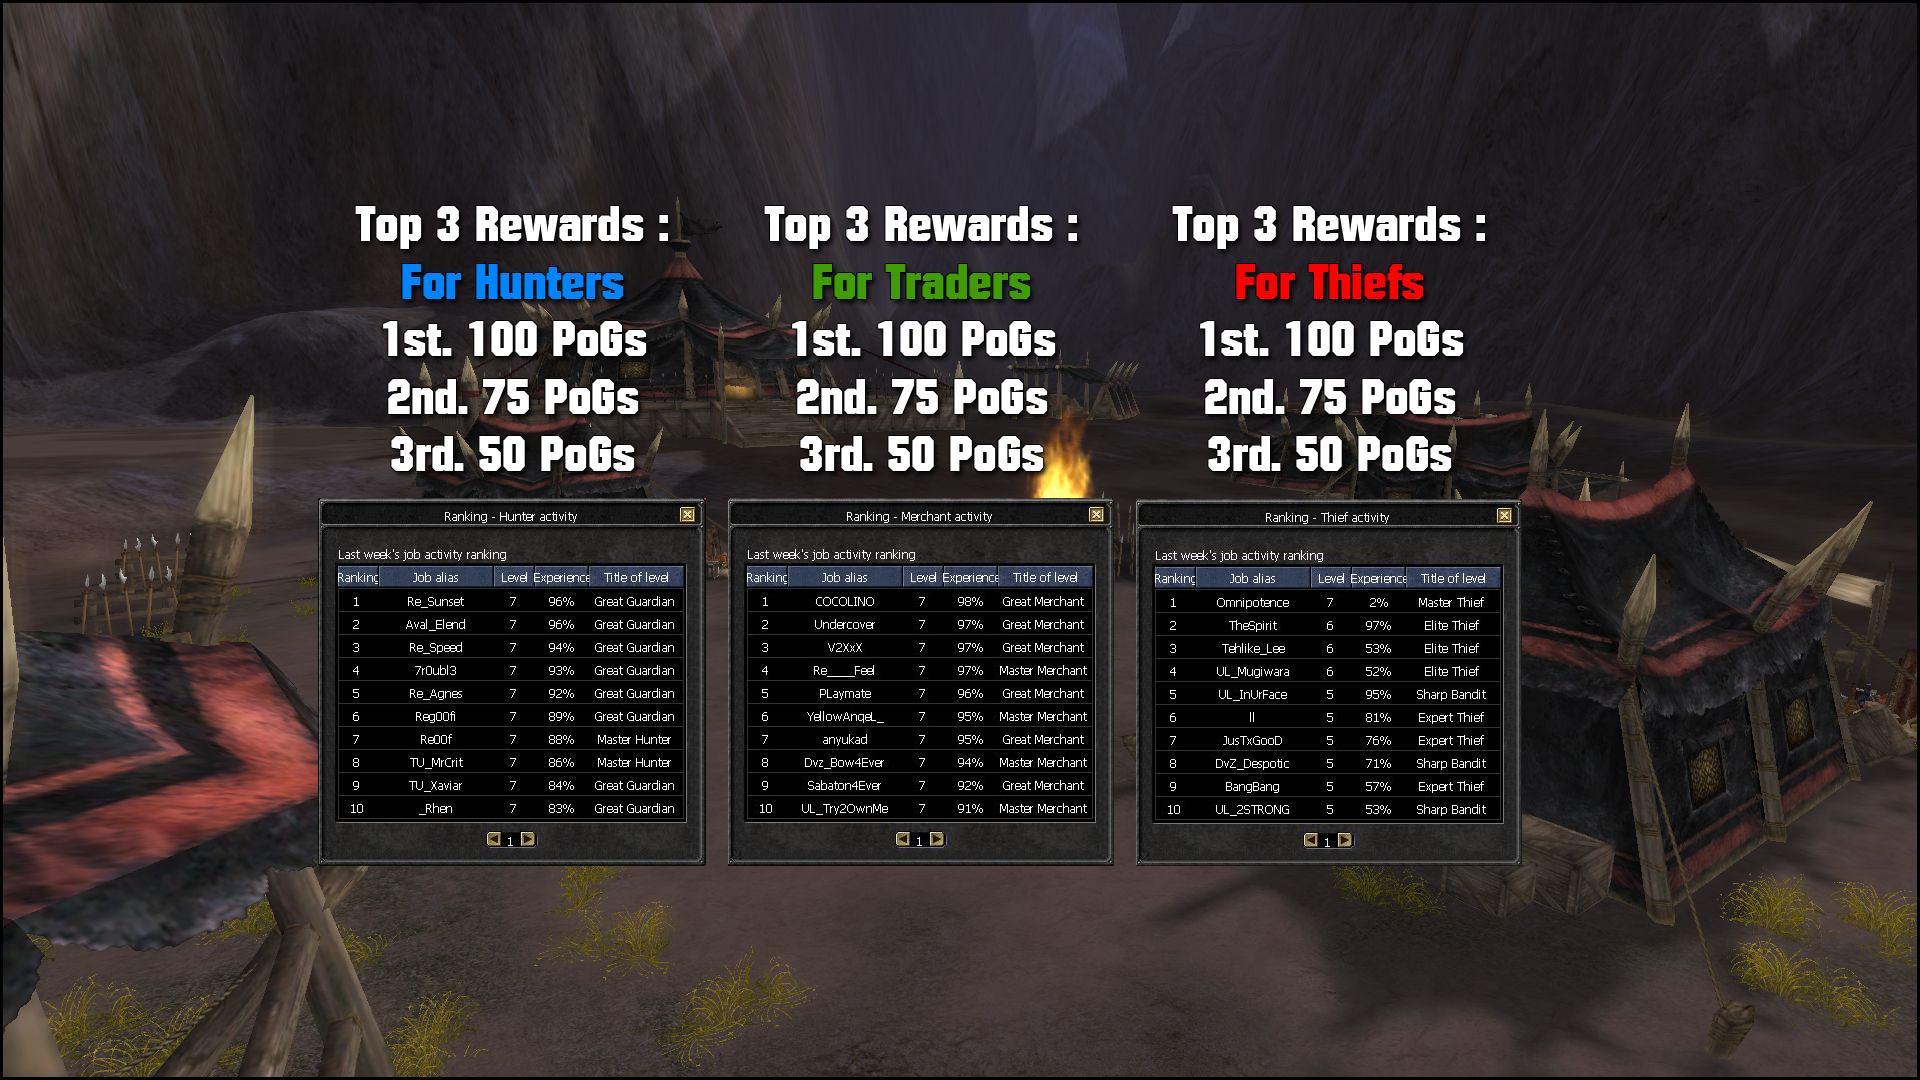 PlayOnGrid Thor | 110 Cap | 11D | Professional Team Pk1bg